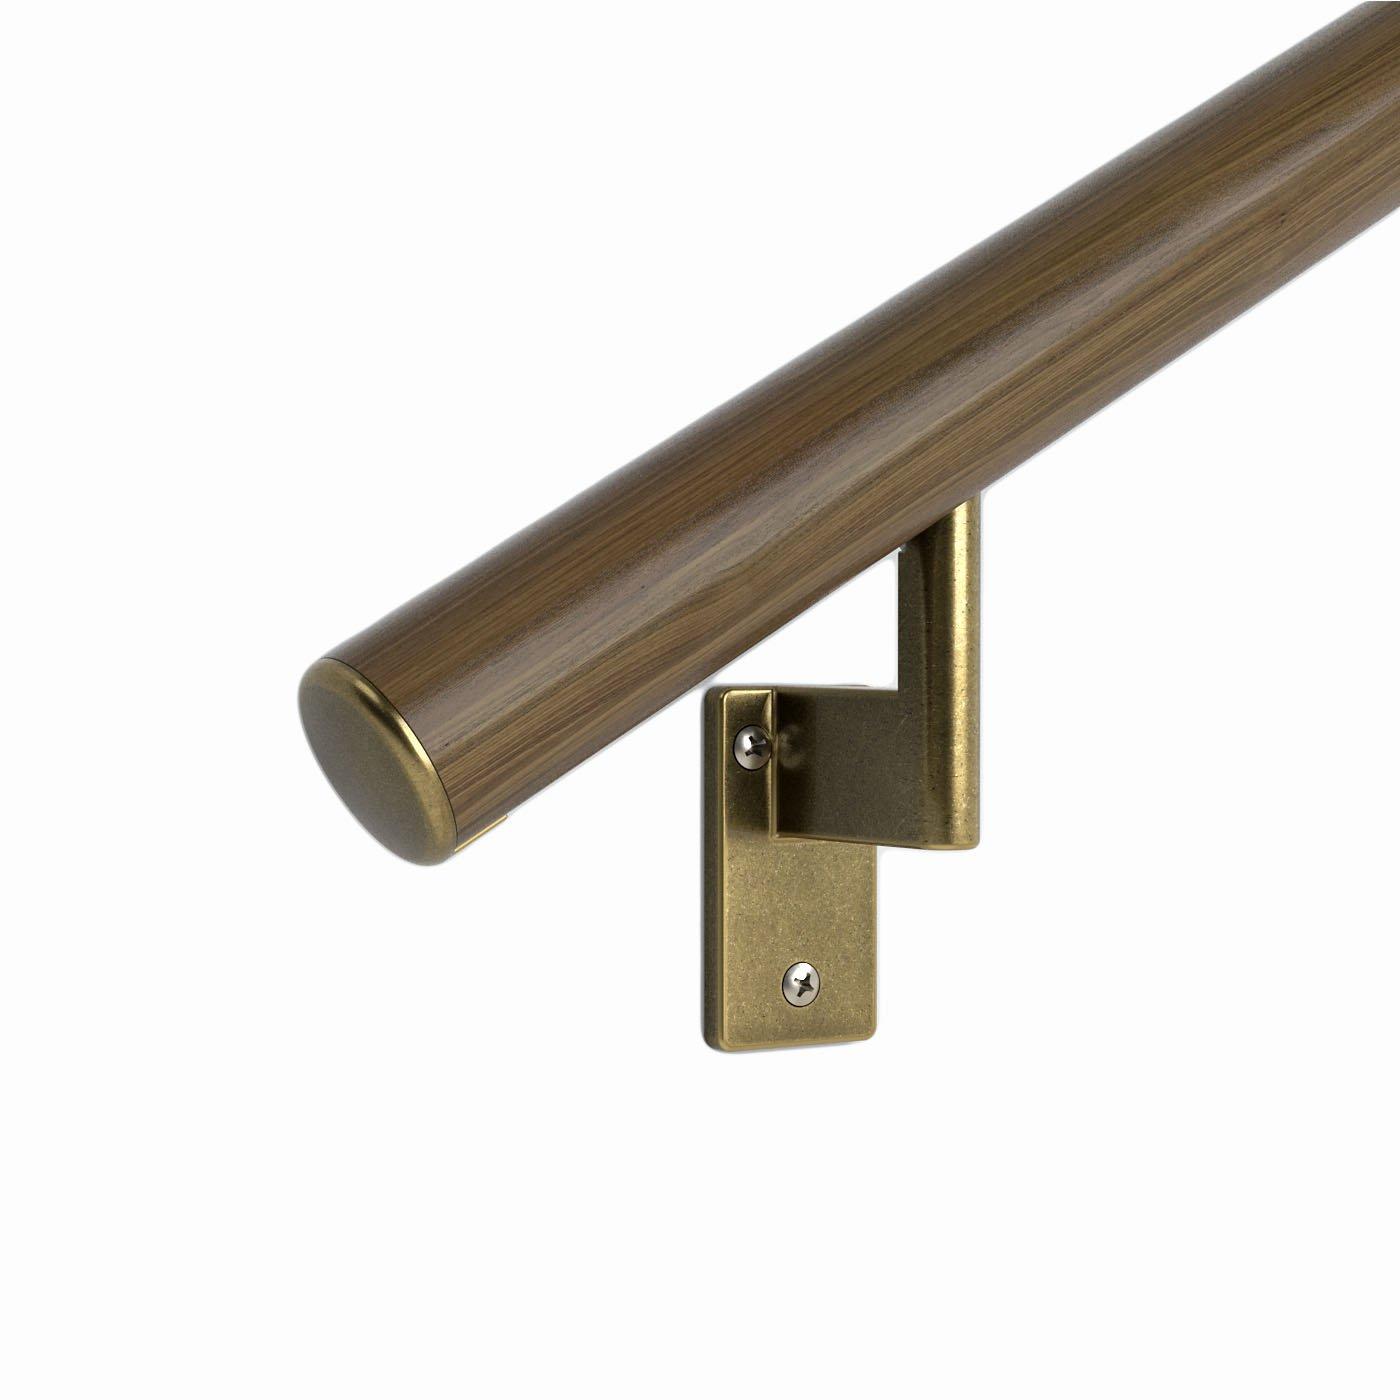 4 ft. Handrail - Complete Kit. Genuine Black Walnut Bonded to Aluminum core, 3 Antique Brass Brackets + Flush Endcaps, 1.6'' Round by PROMENAID